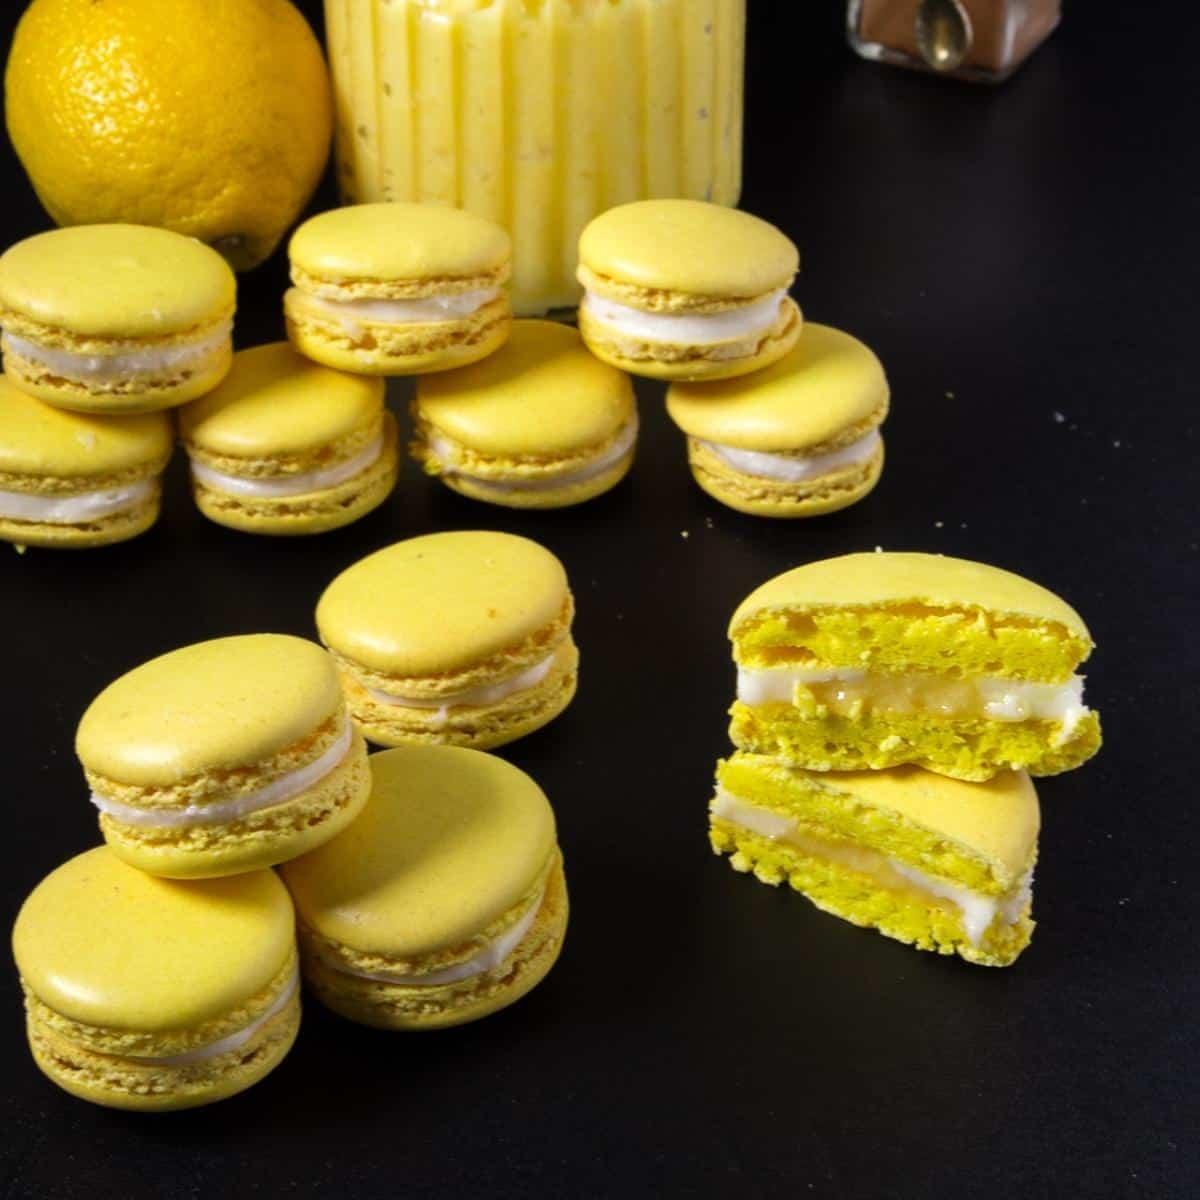 Cut macarons showing the inside lemon curd